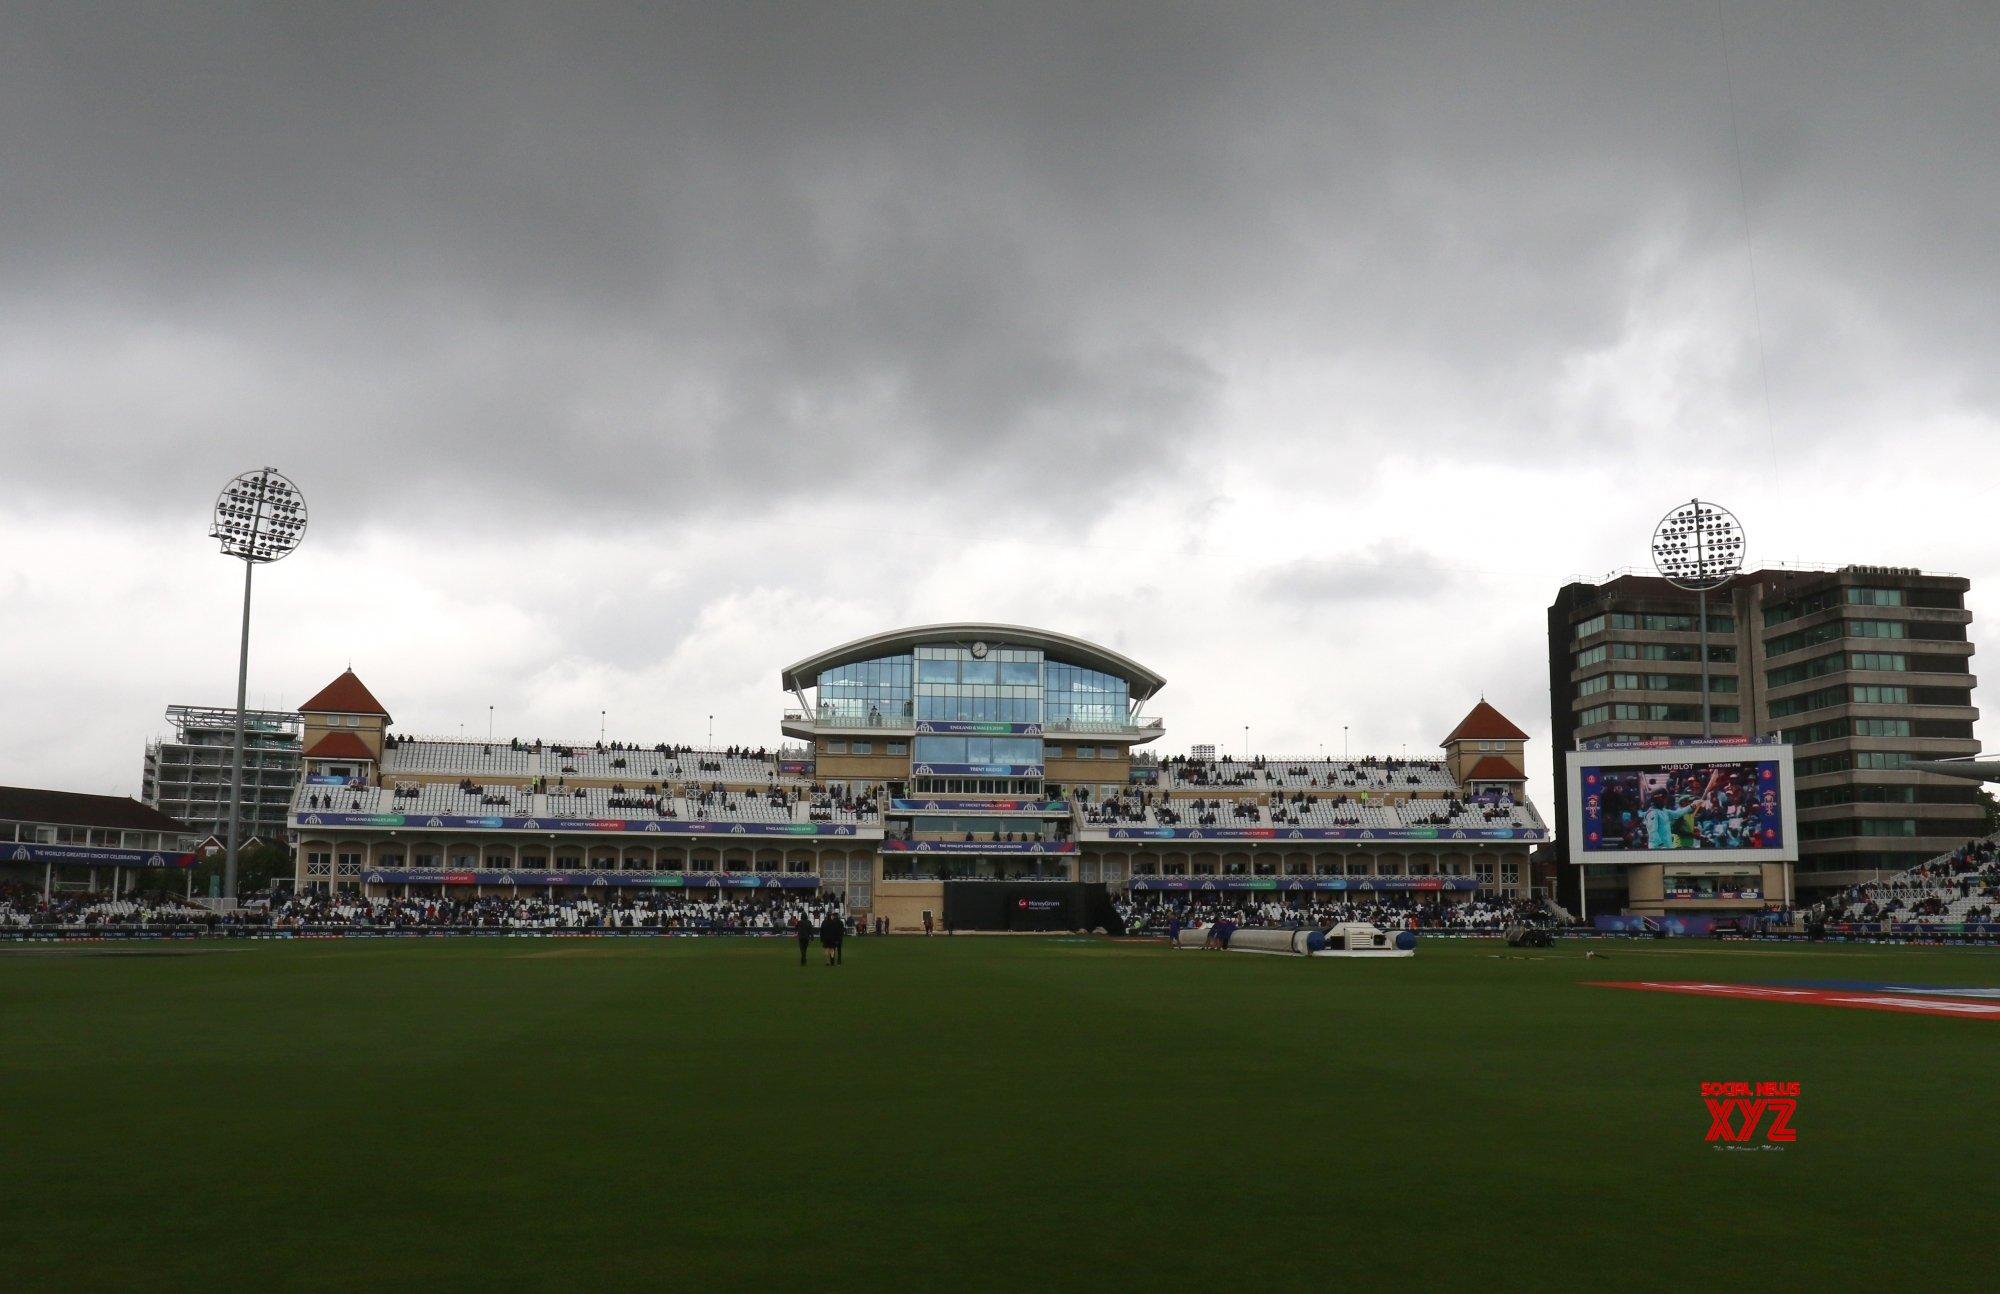 Nottingham (England): World Cup 2019 - Match 18 - India Vs New Zealand (Batch - 5) #Gallery